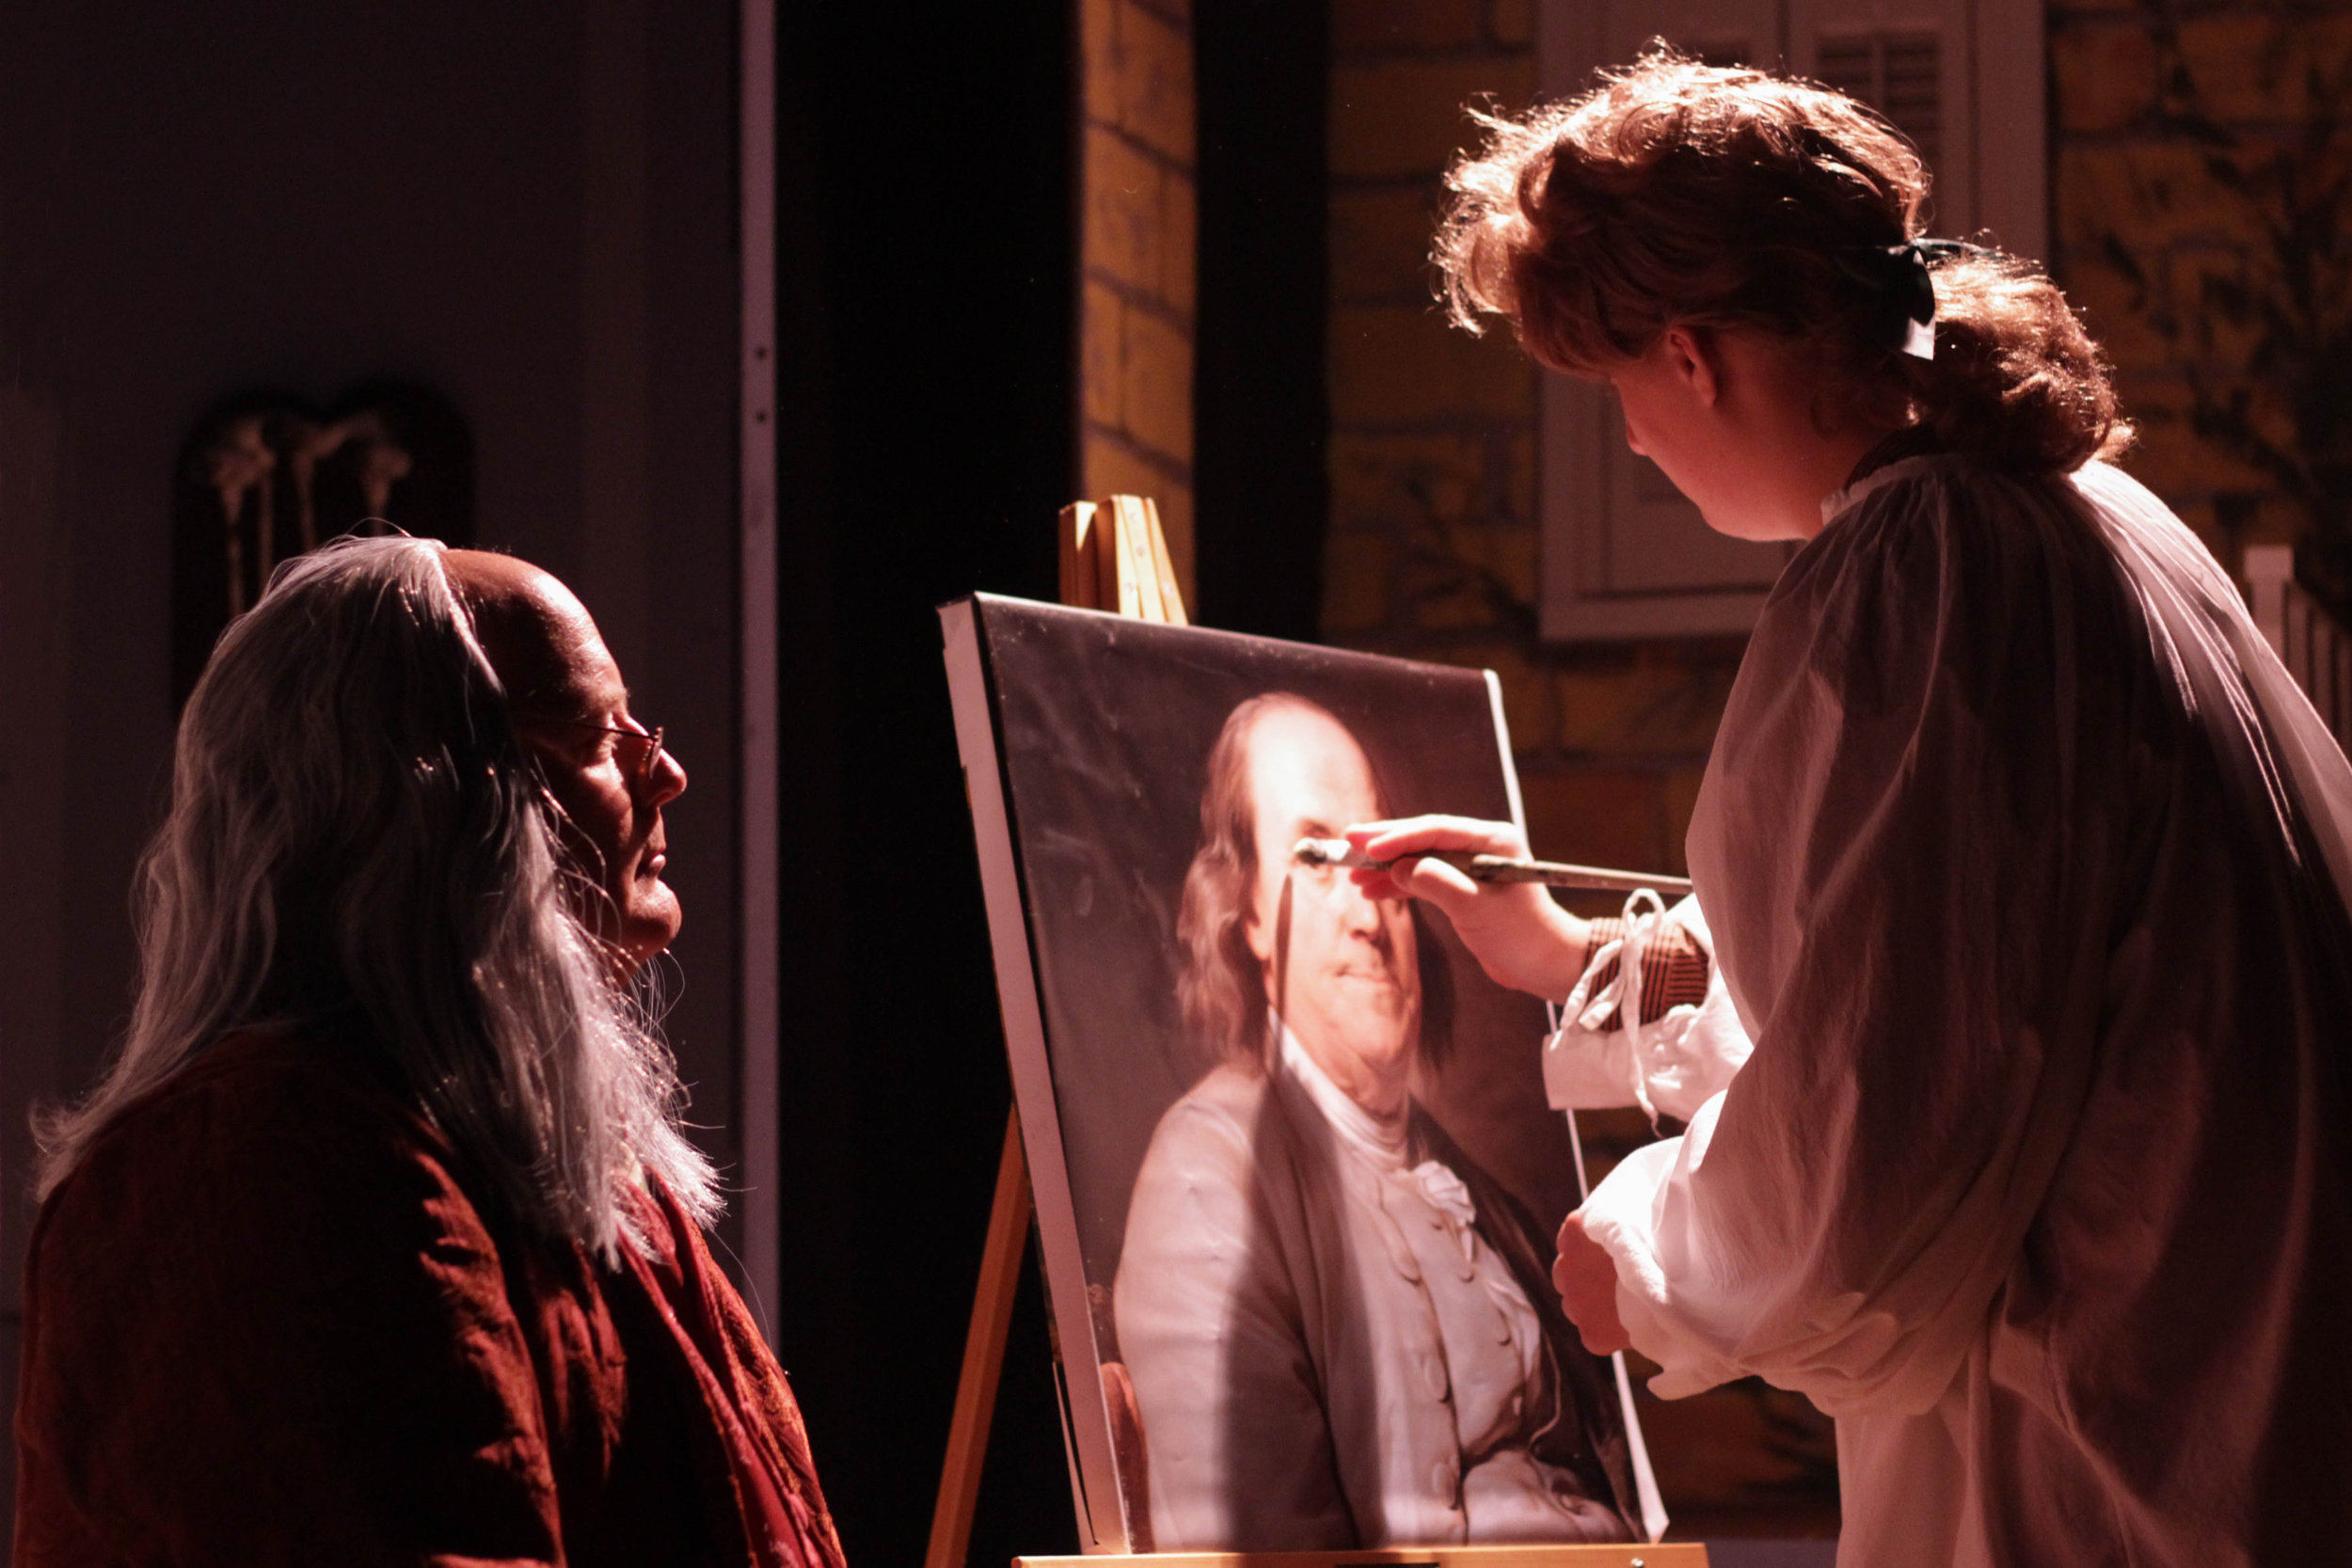 Marty Graffenius as Benjamin Franklin poses for a self portrait.